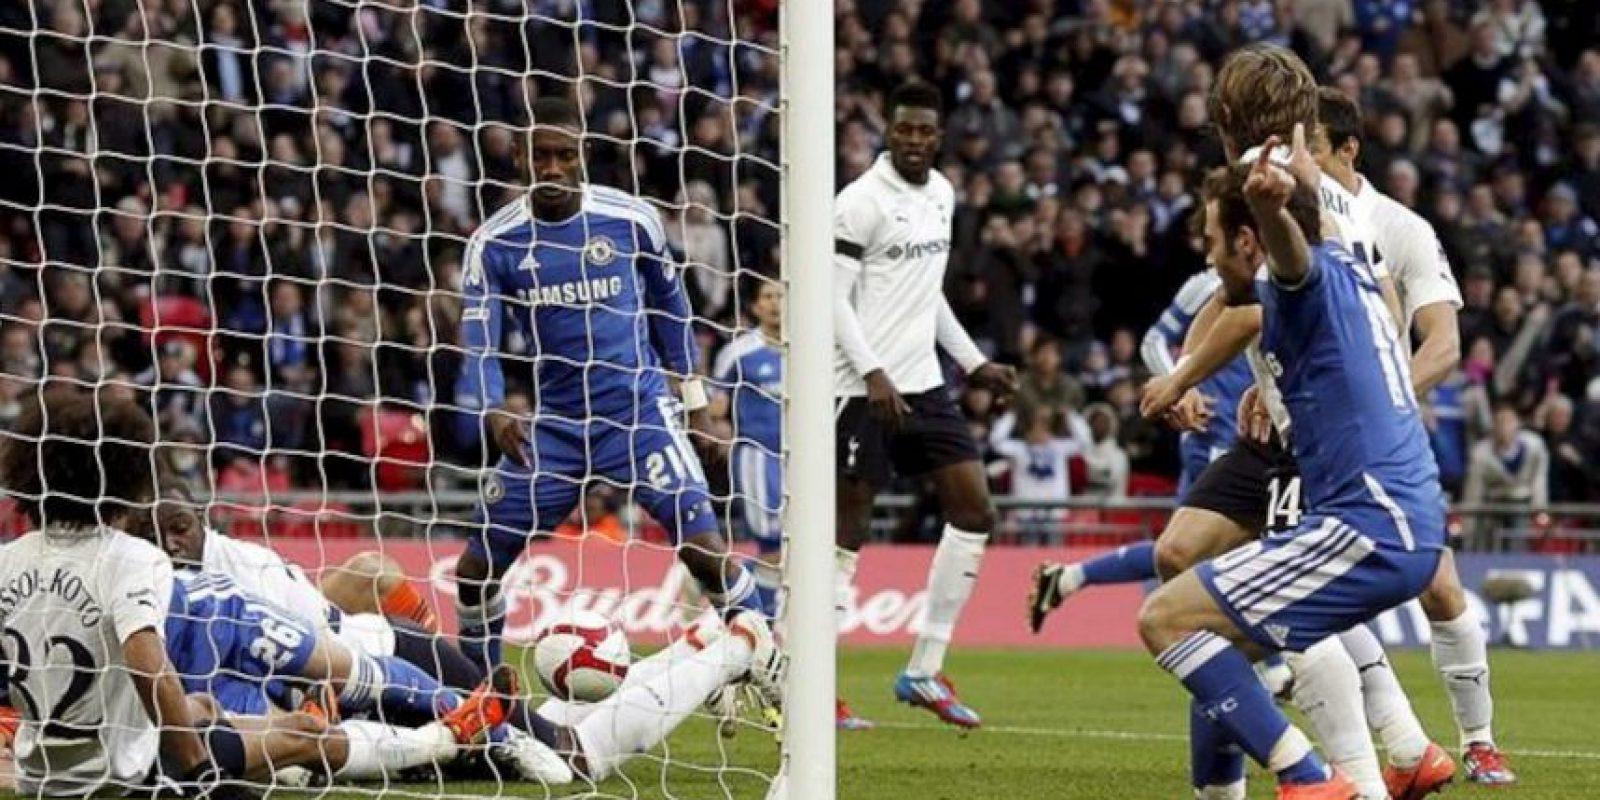 El jugador español del Chelsea Juan Mata (izq) marca el 2-0 al Tottenham Hotspur durante el partido de semifinales de la Copa Inglesa (FA Cup) disputado en el estadio de Wembley en Londres, Reino Unido. EPA